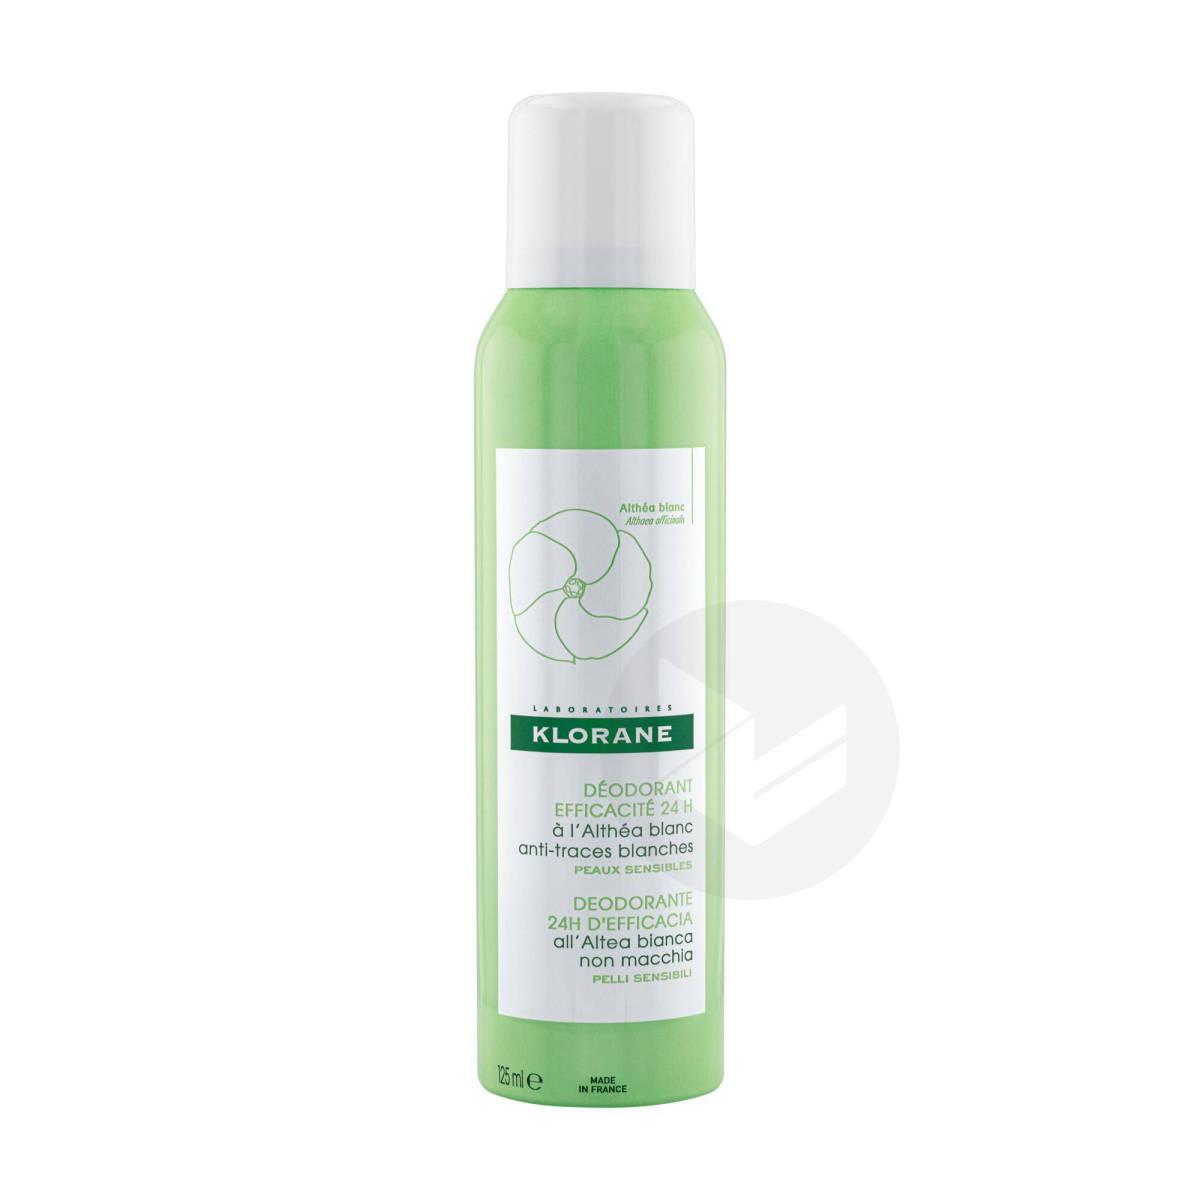 Déodorant Spray à l'Althéa Blanc efficacité 24h 125ml